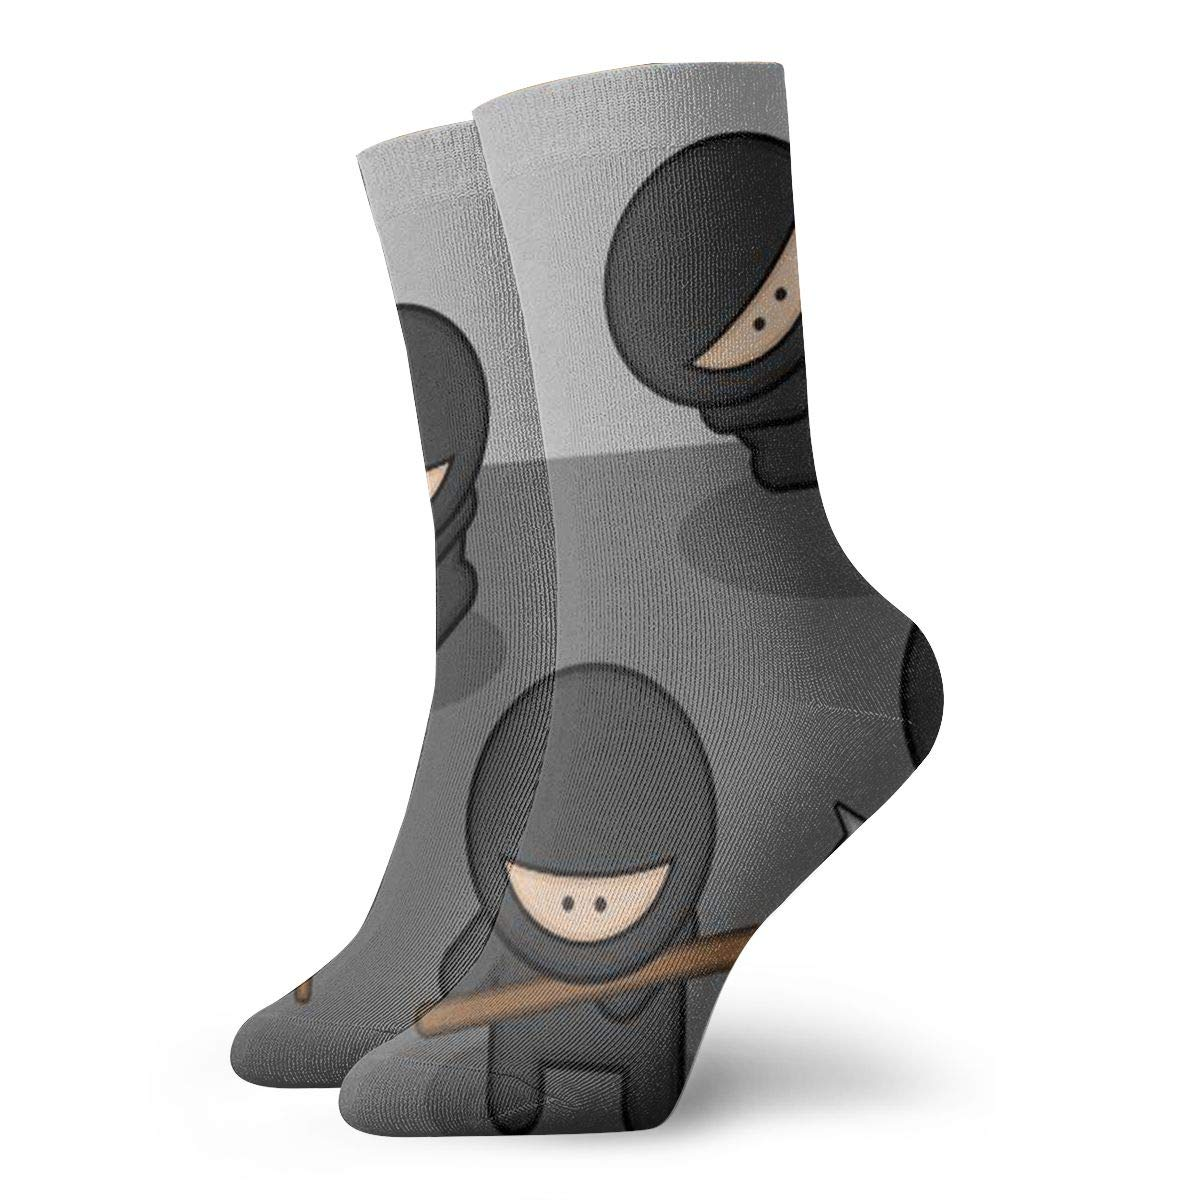 Amazon.com: Unisex Cute Funny Casual Cotton Crew 3D Print ...